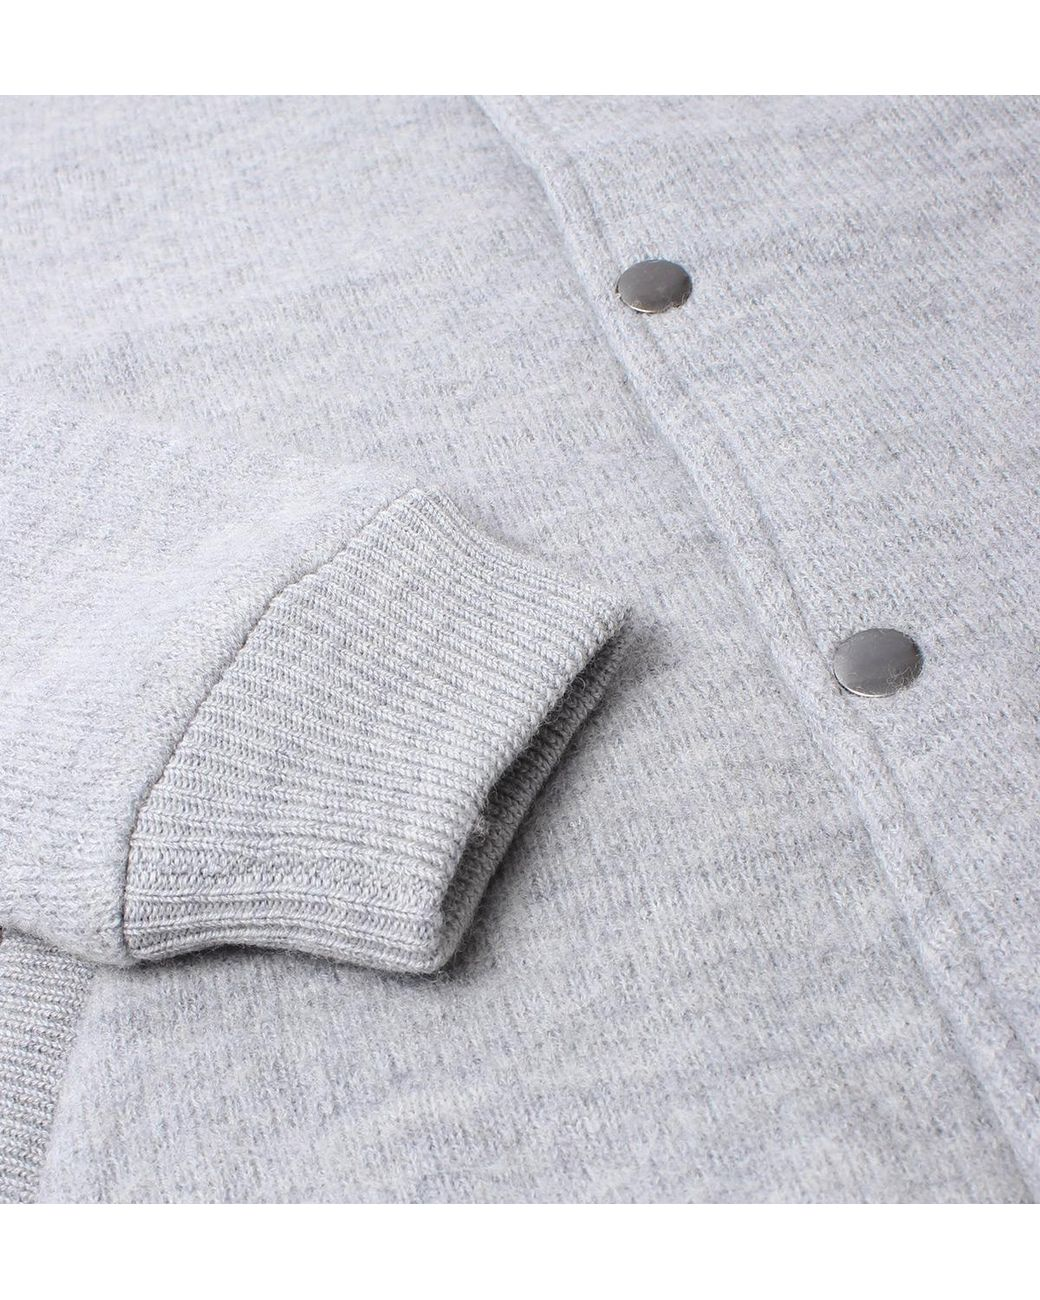 Knitted Grey Jacket Lyst Bomber Farah In Gray Macauley Men For USMVzGLqp